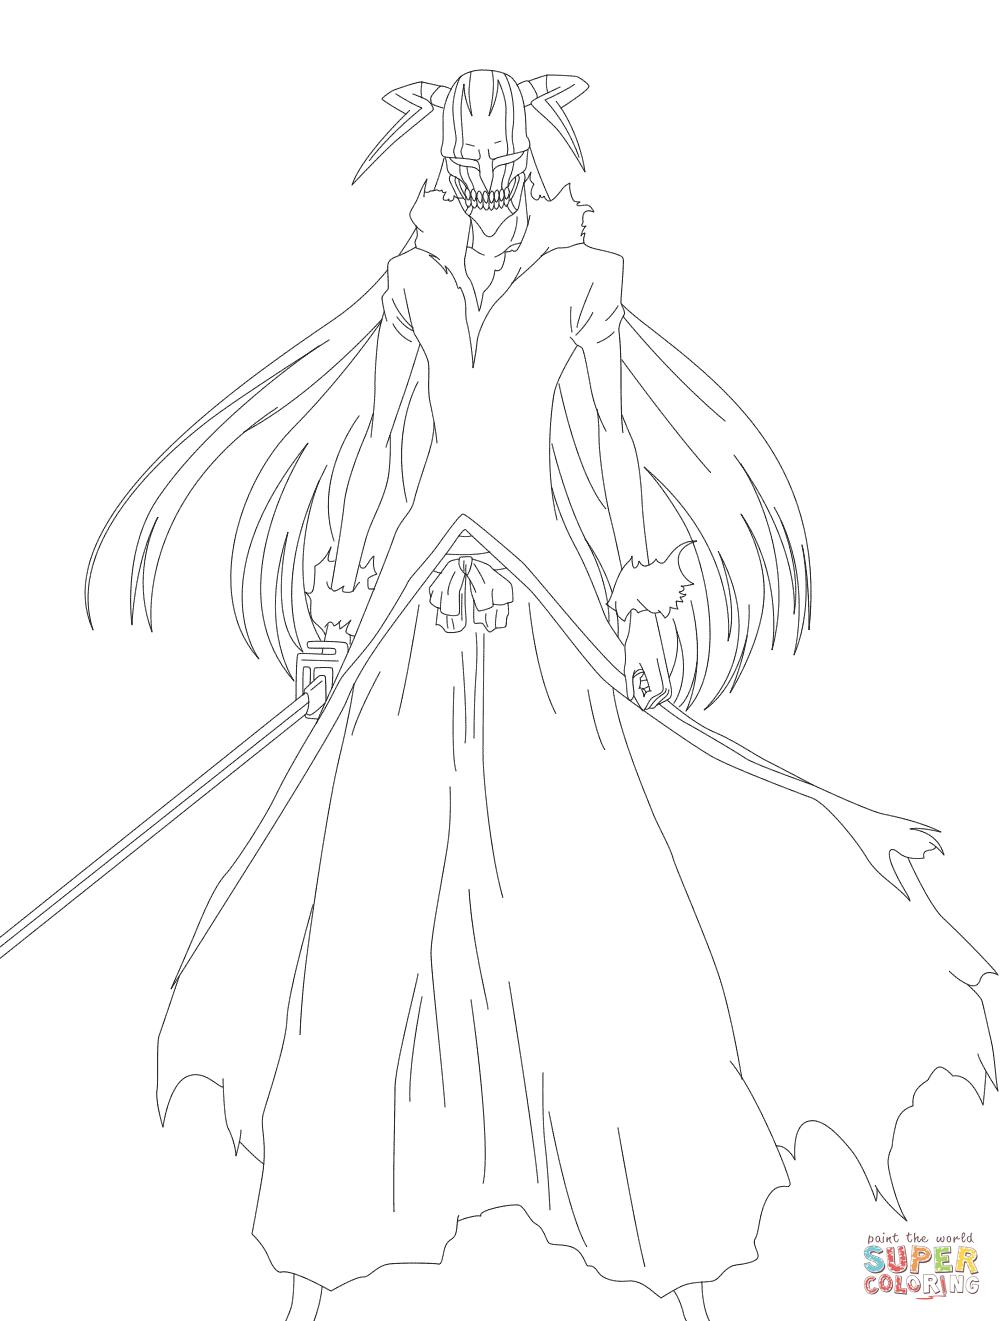 Ichigo Coloring Pages Coloring